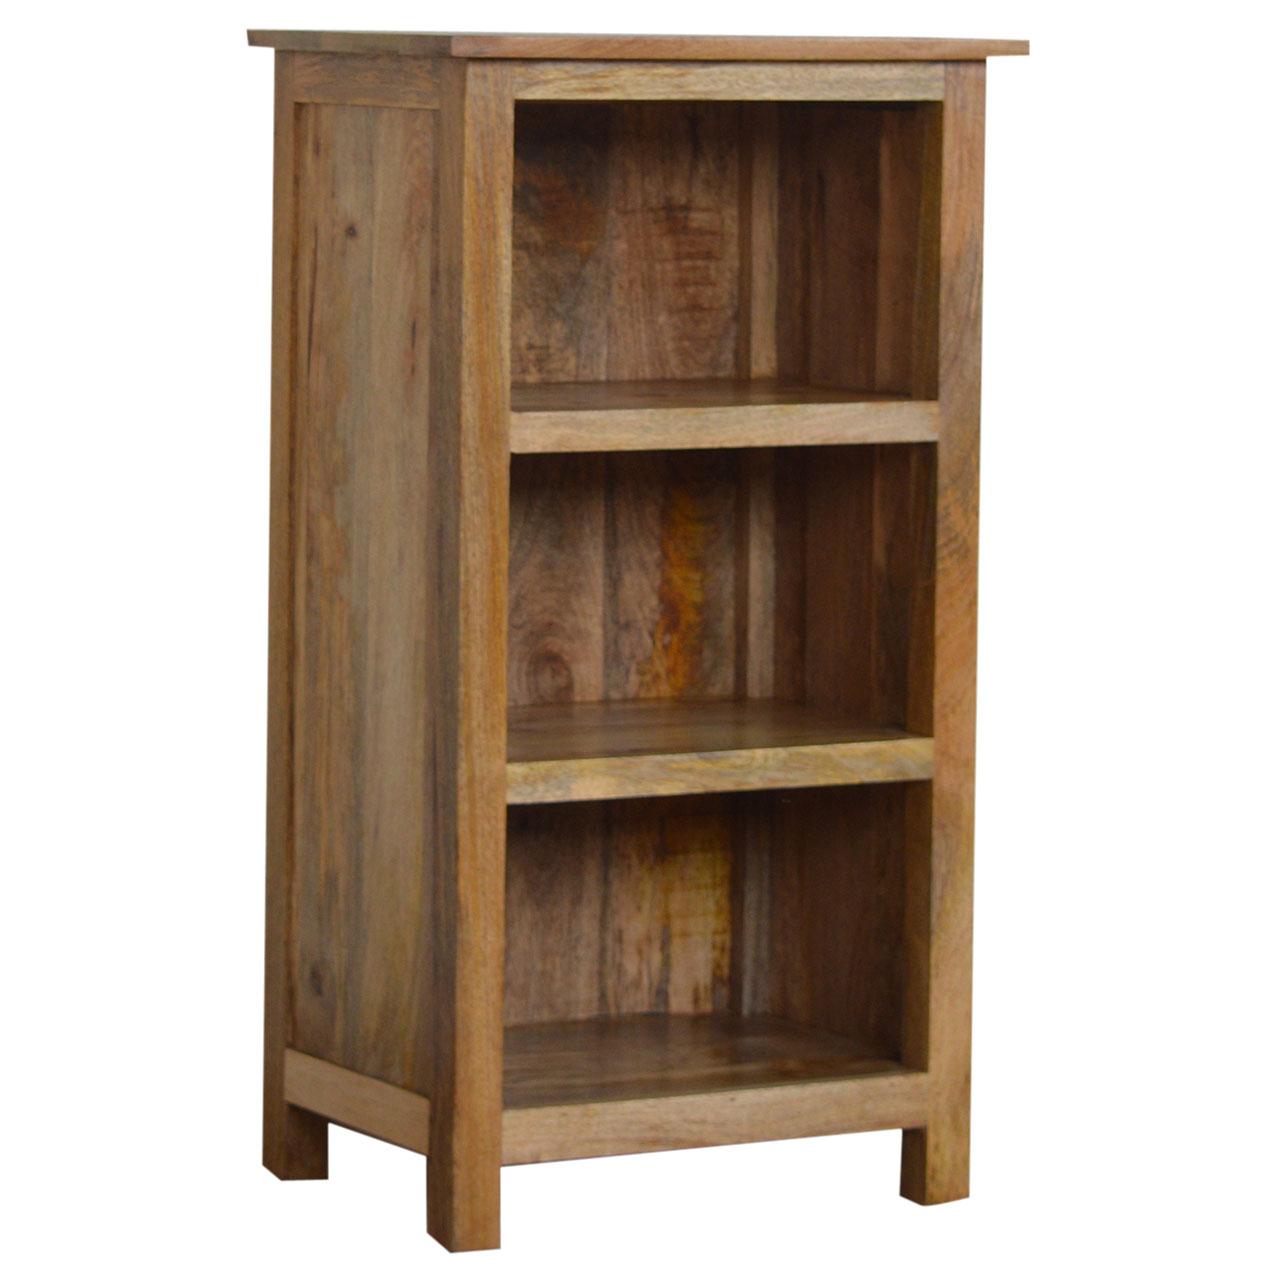 IN002 102cm Rustic Bookcase 3 Shelves